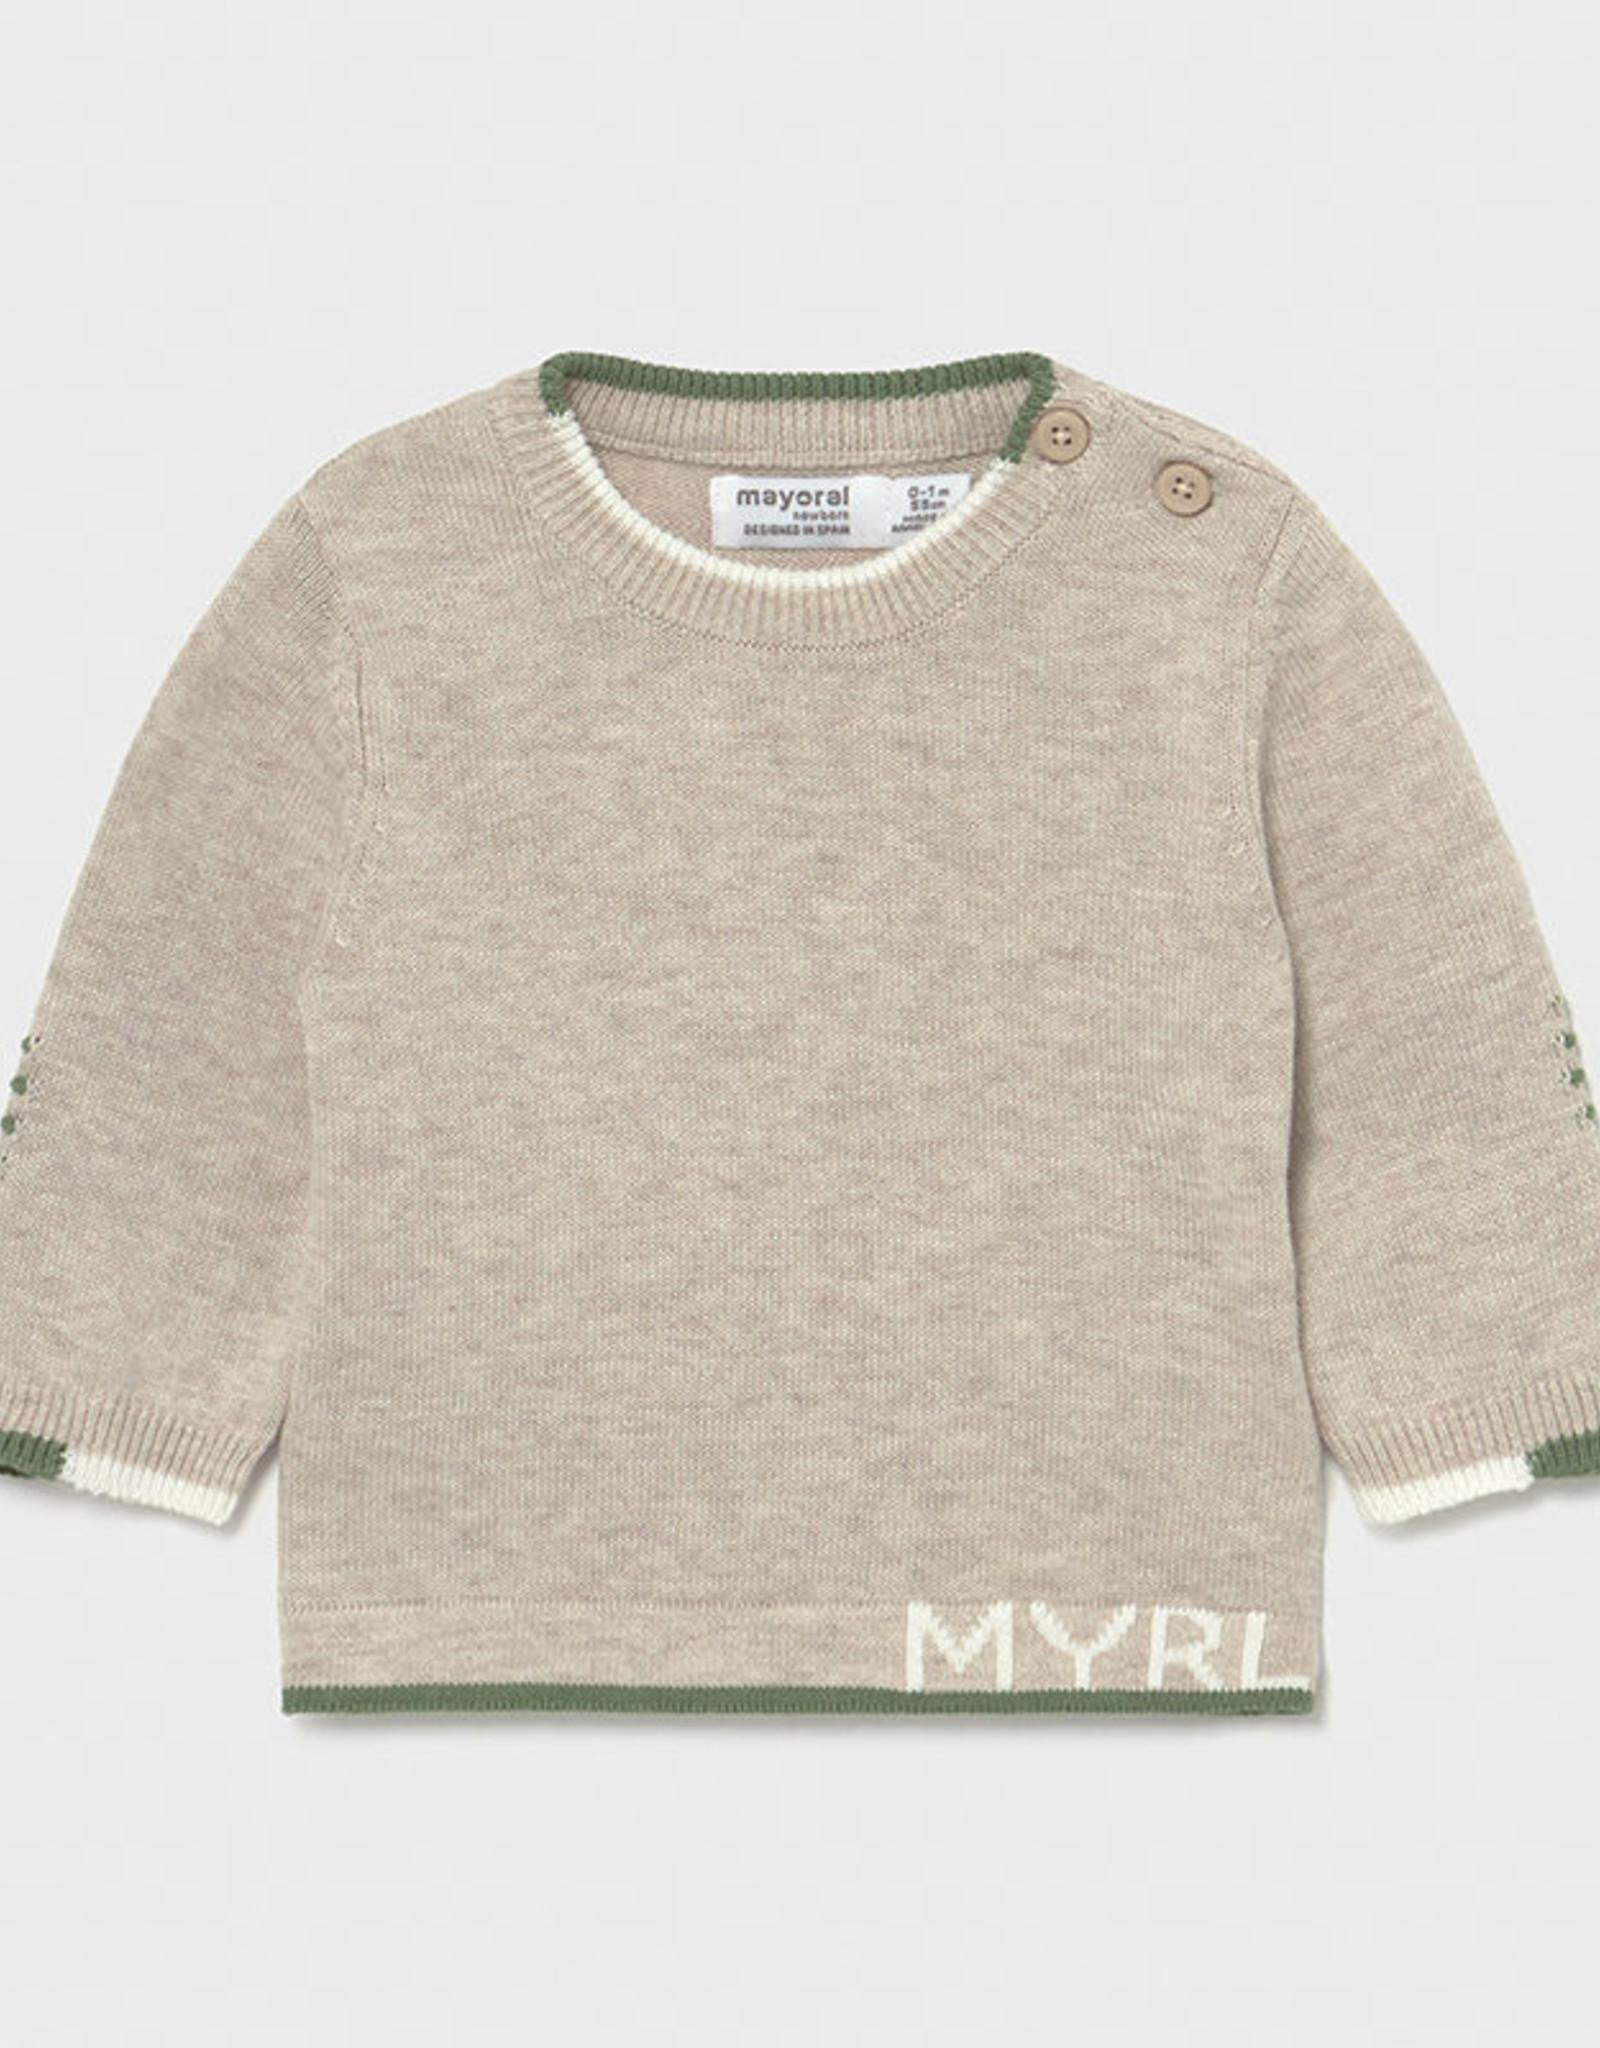 Mayoral SP21 BbyB Tan Sweater